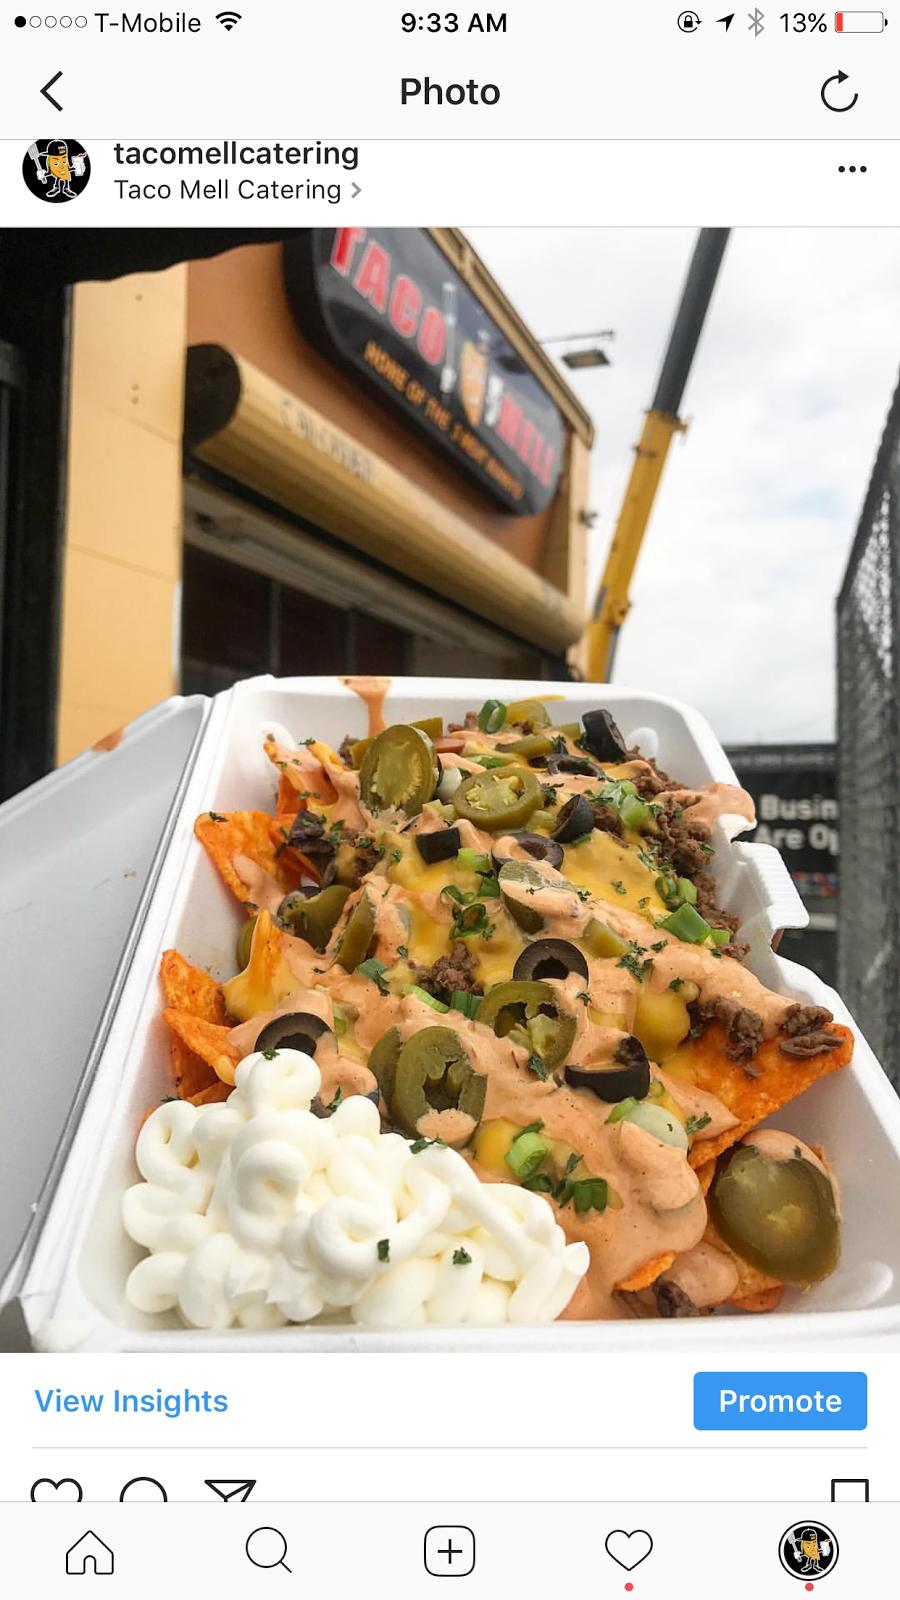 Taco Mell Catering - Restaurant | 4326 Crenshaw Blvd, Los